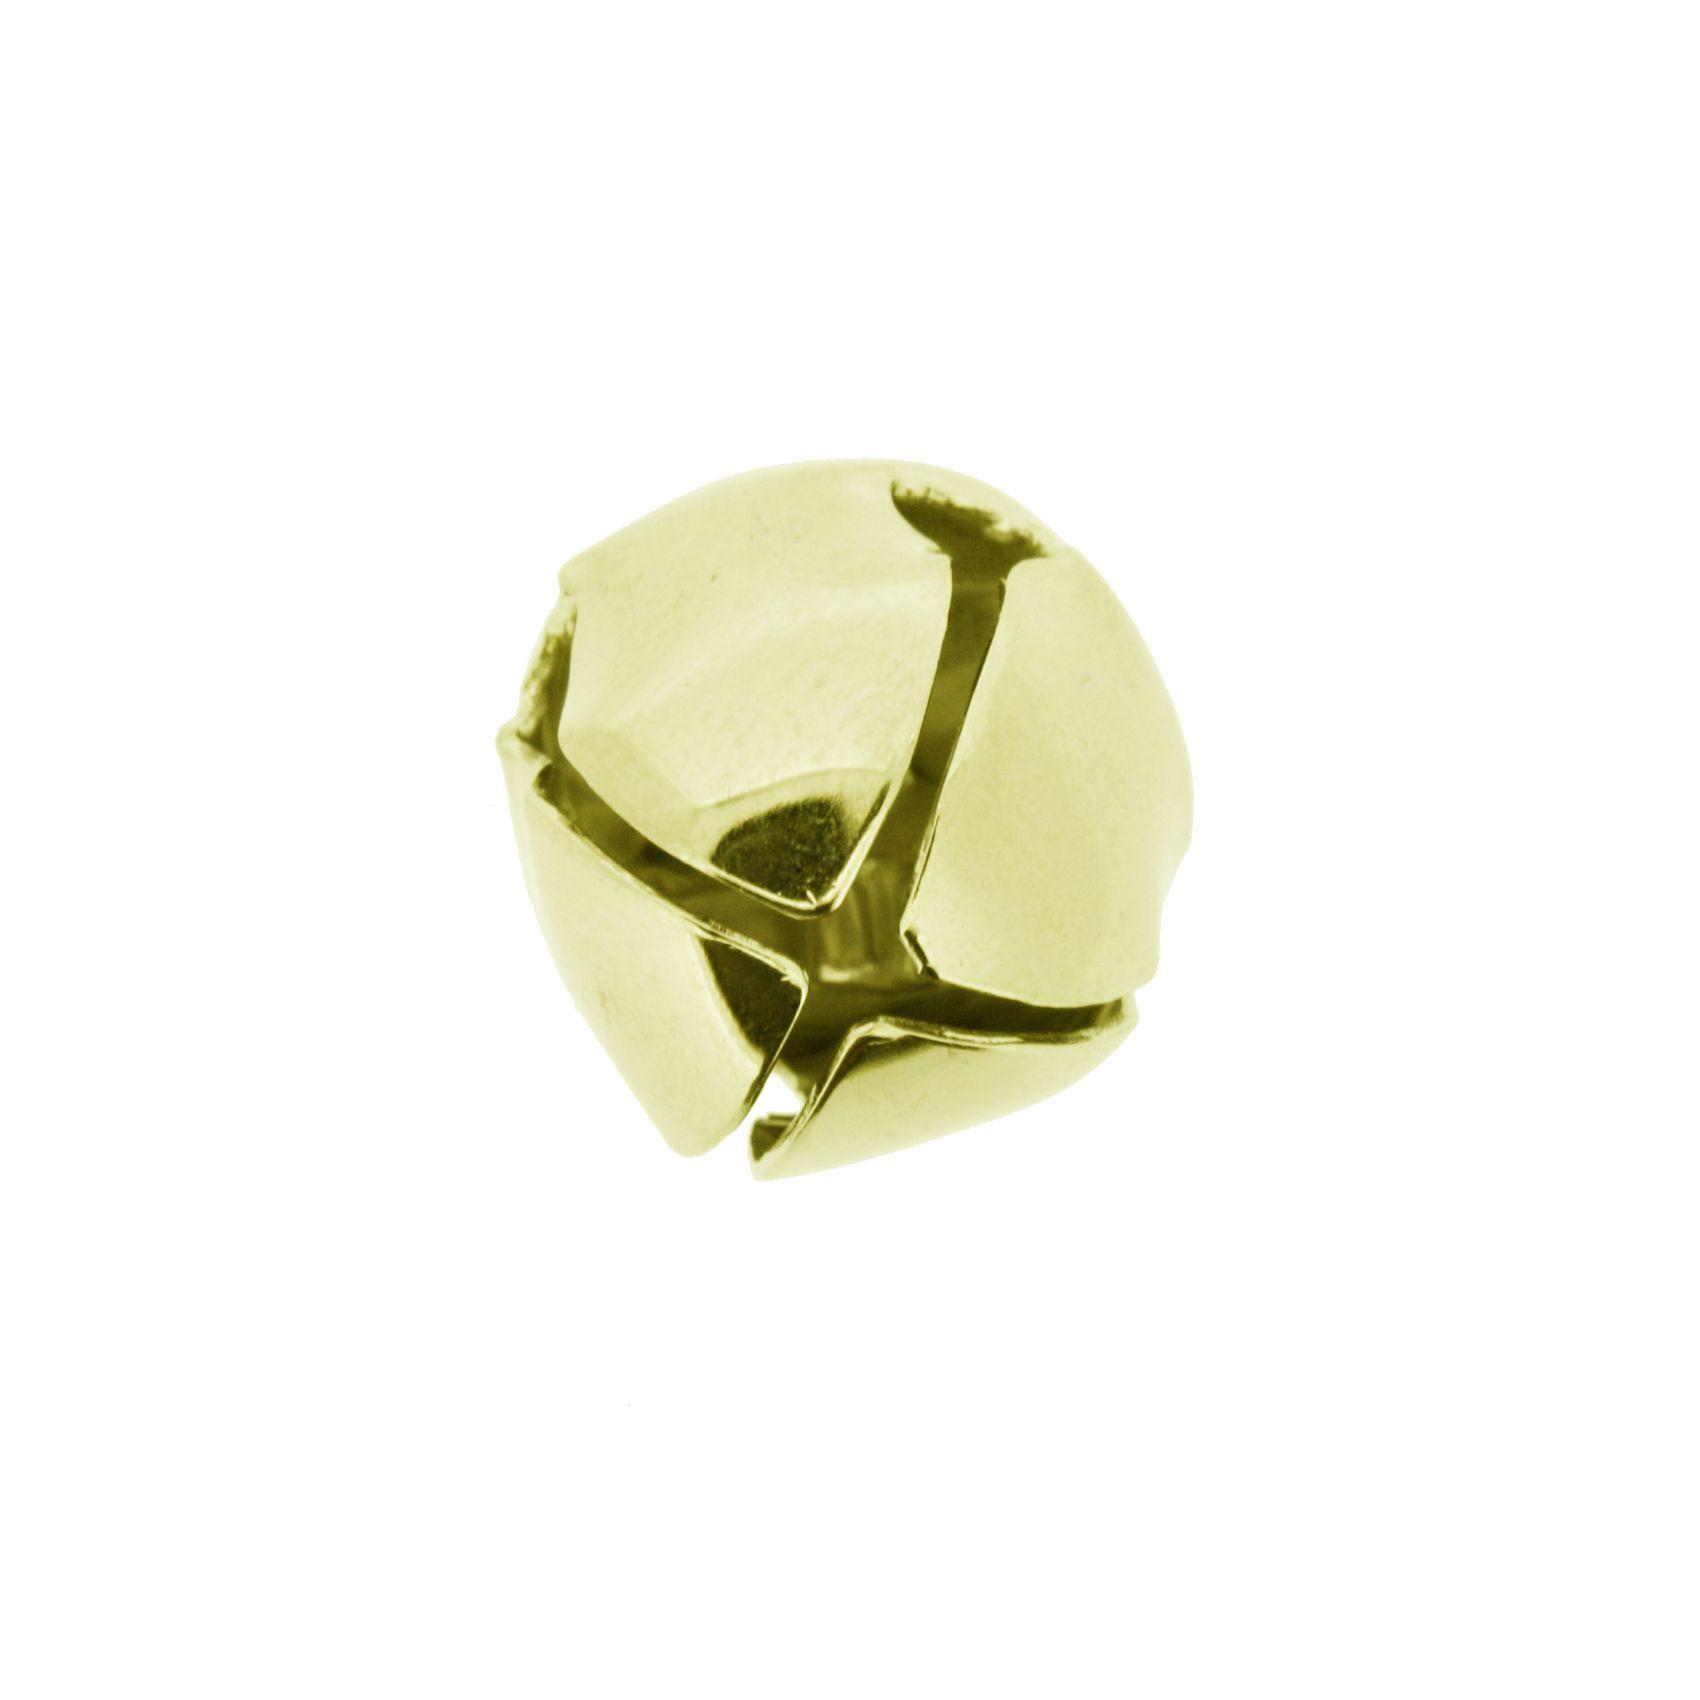 Guizo - Xaôro nº3 - Dourado - 01 peça  - Universo Religioso® - Artigos de Umbanda e Candomblé